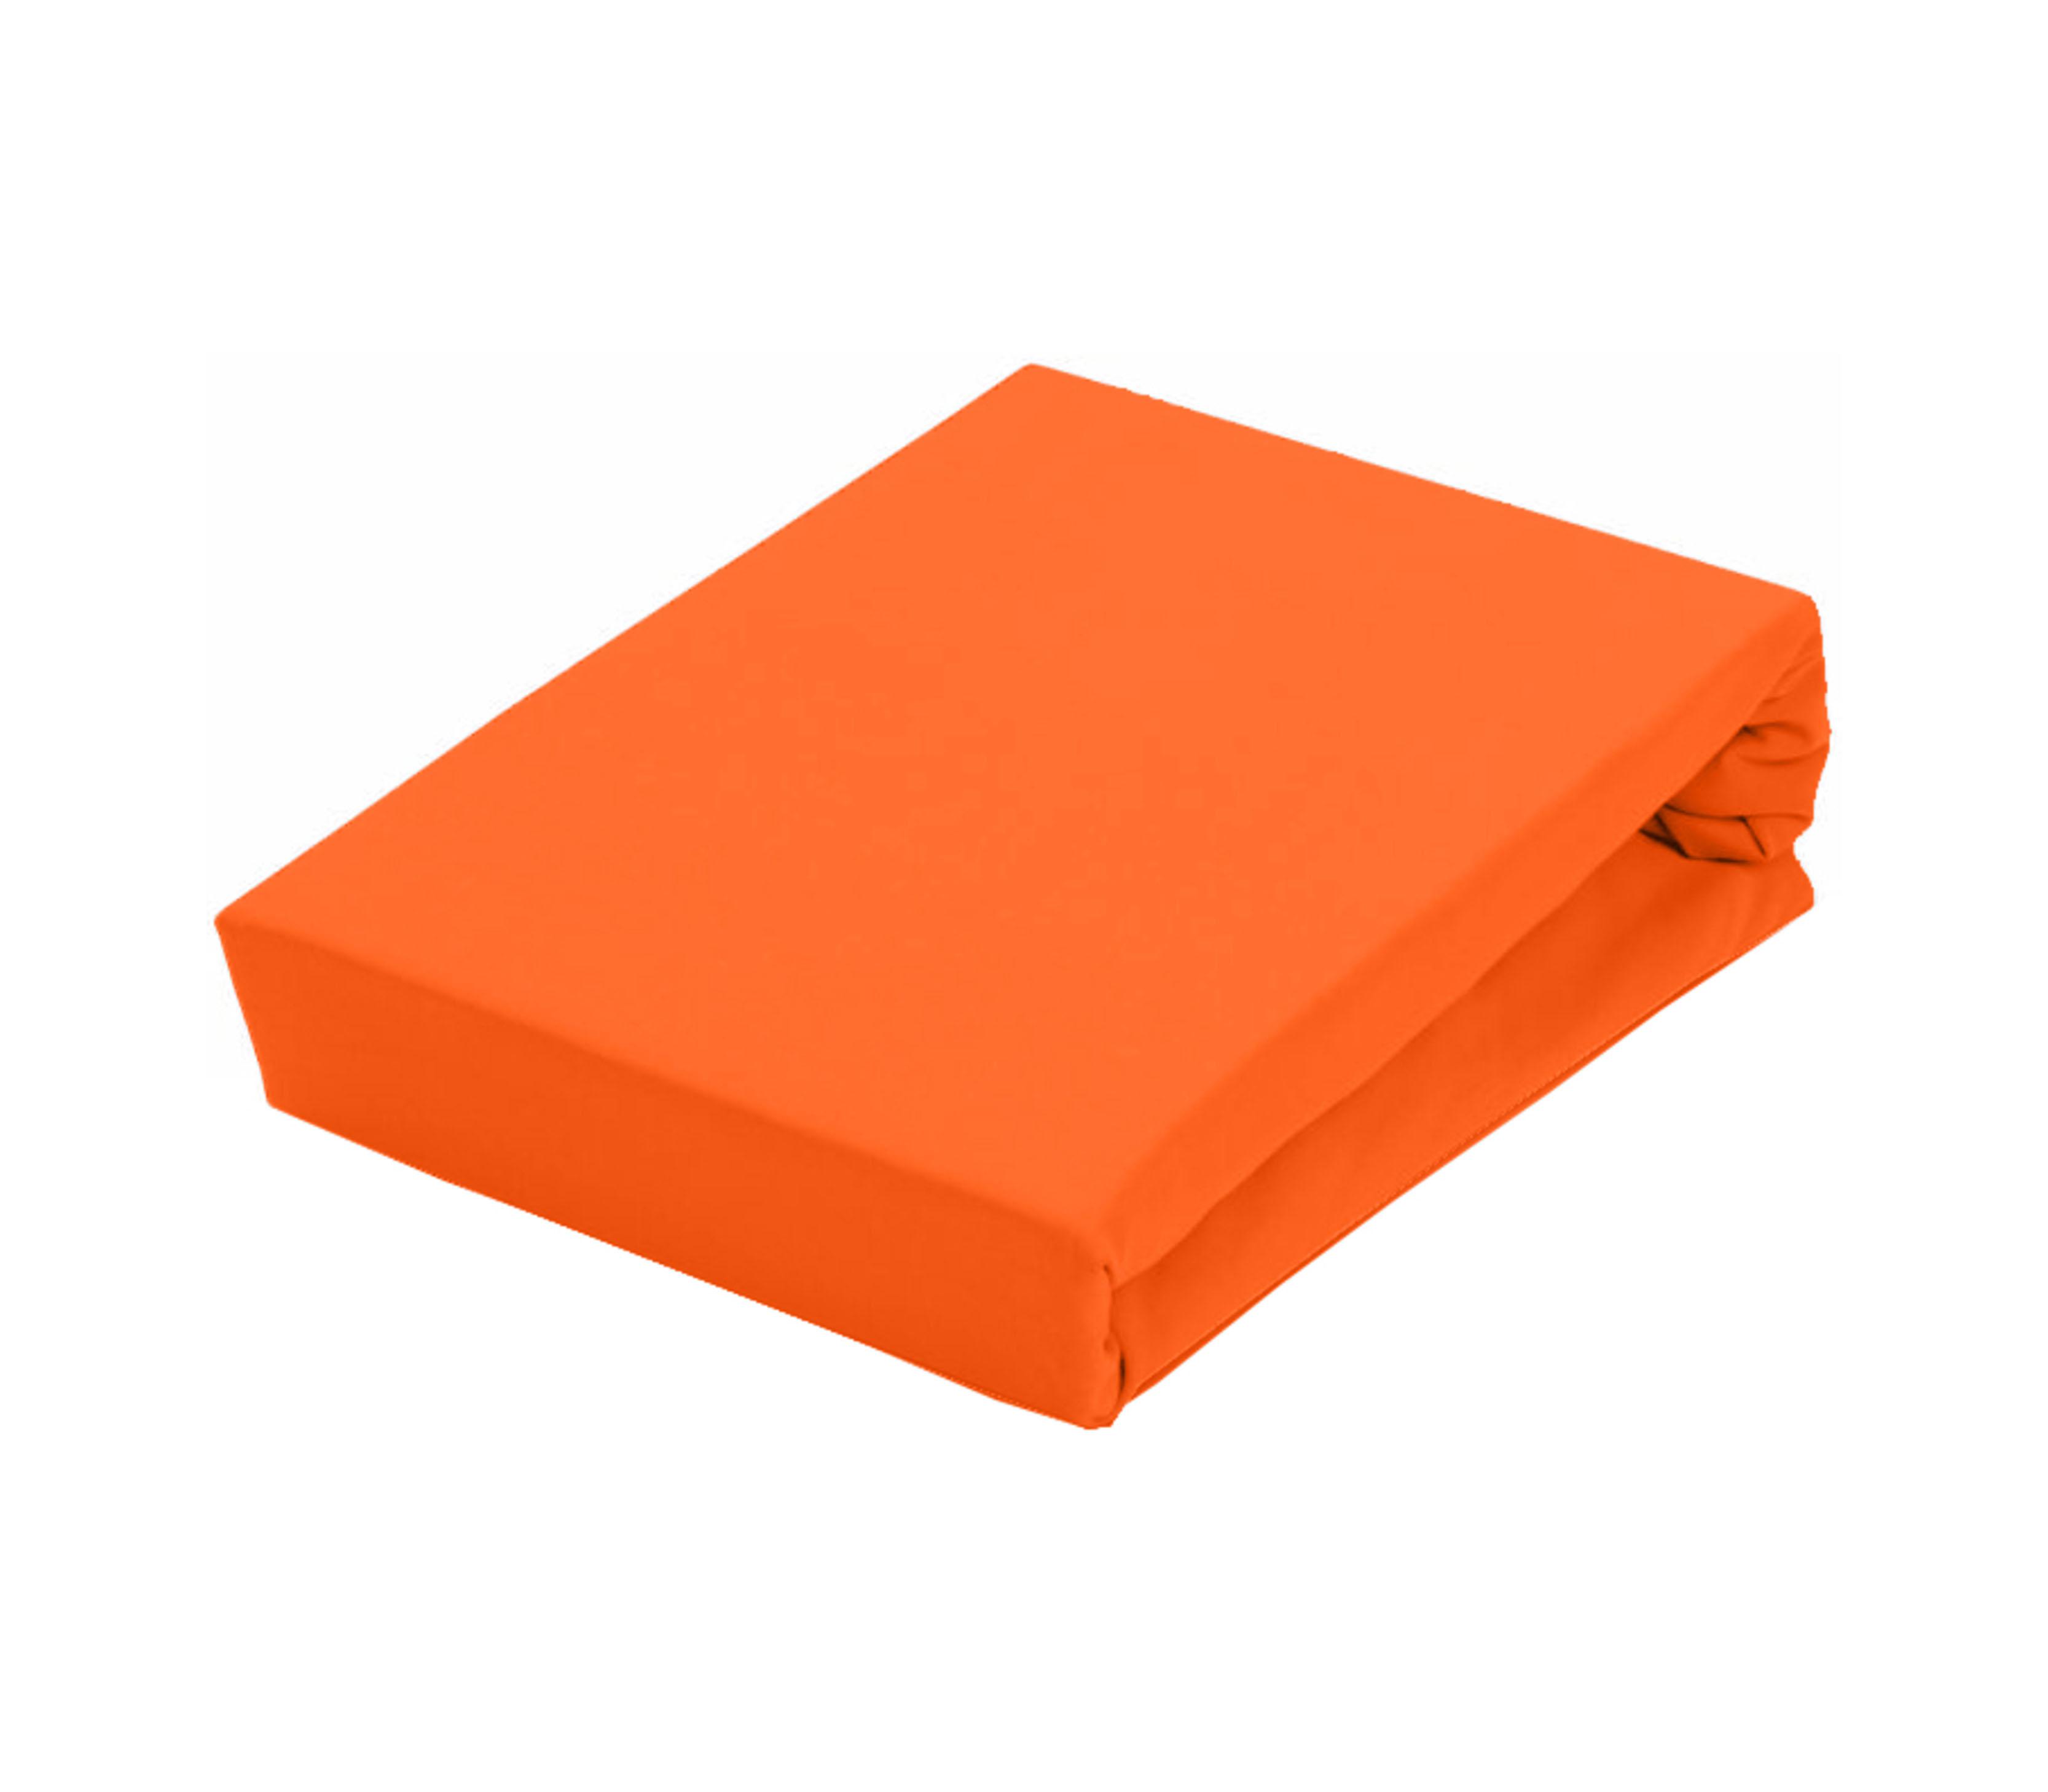 Aga Prostěradlo JERSEY 160x200 cm  Barva prostěradla: Oranžová